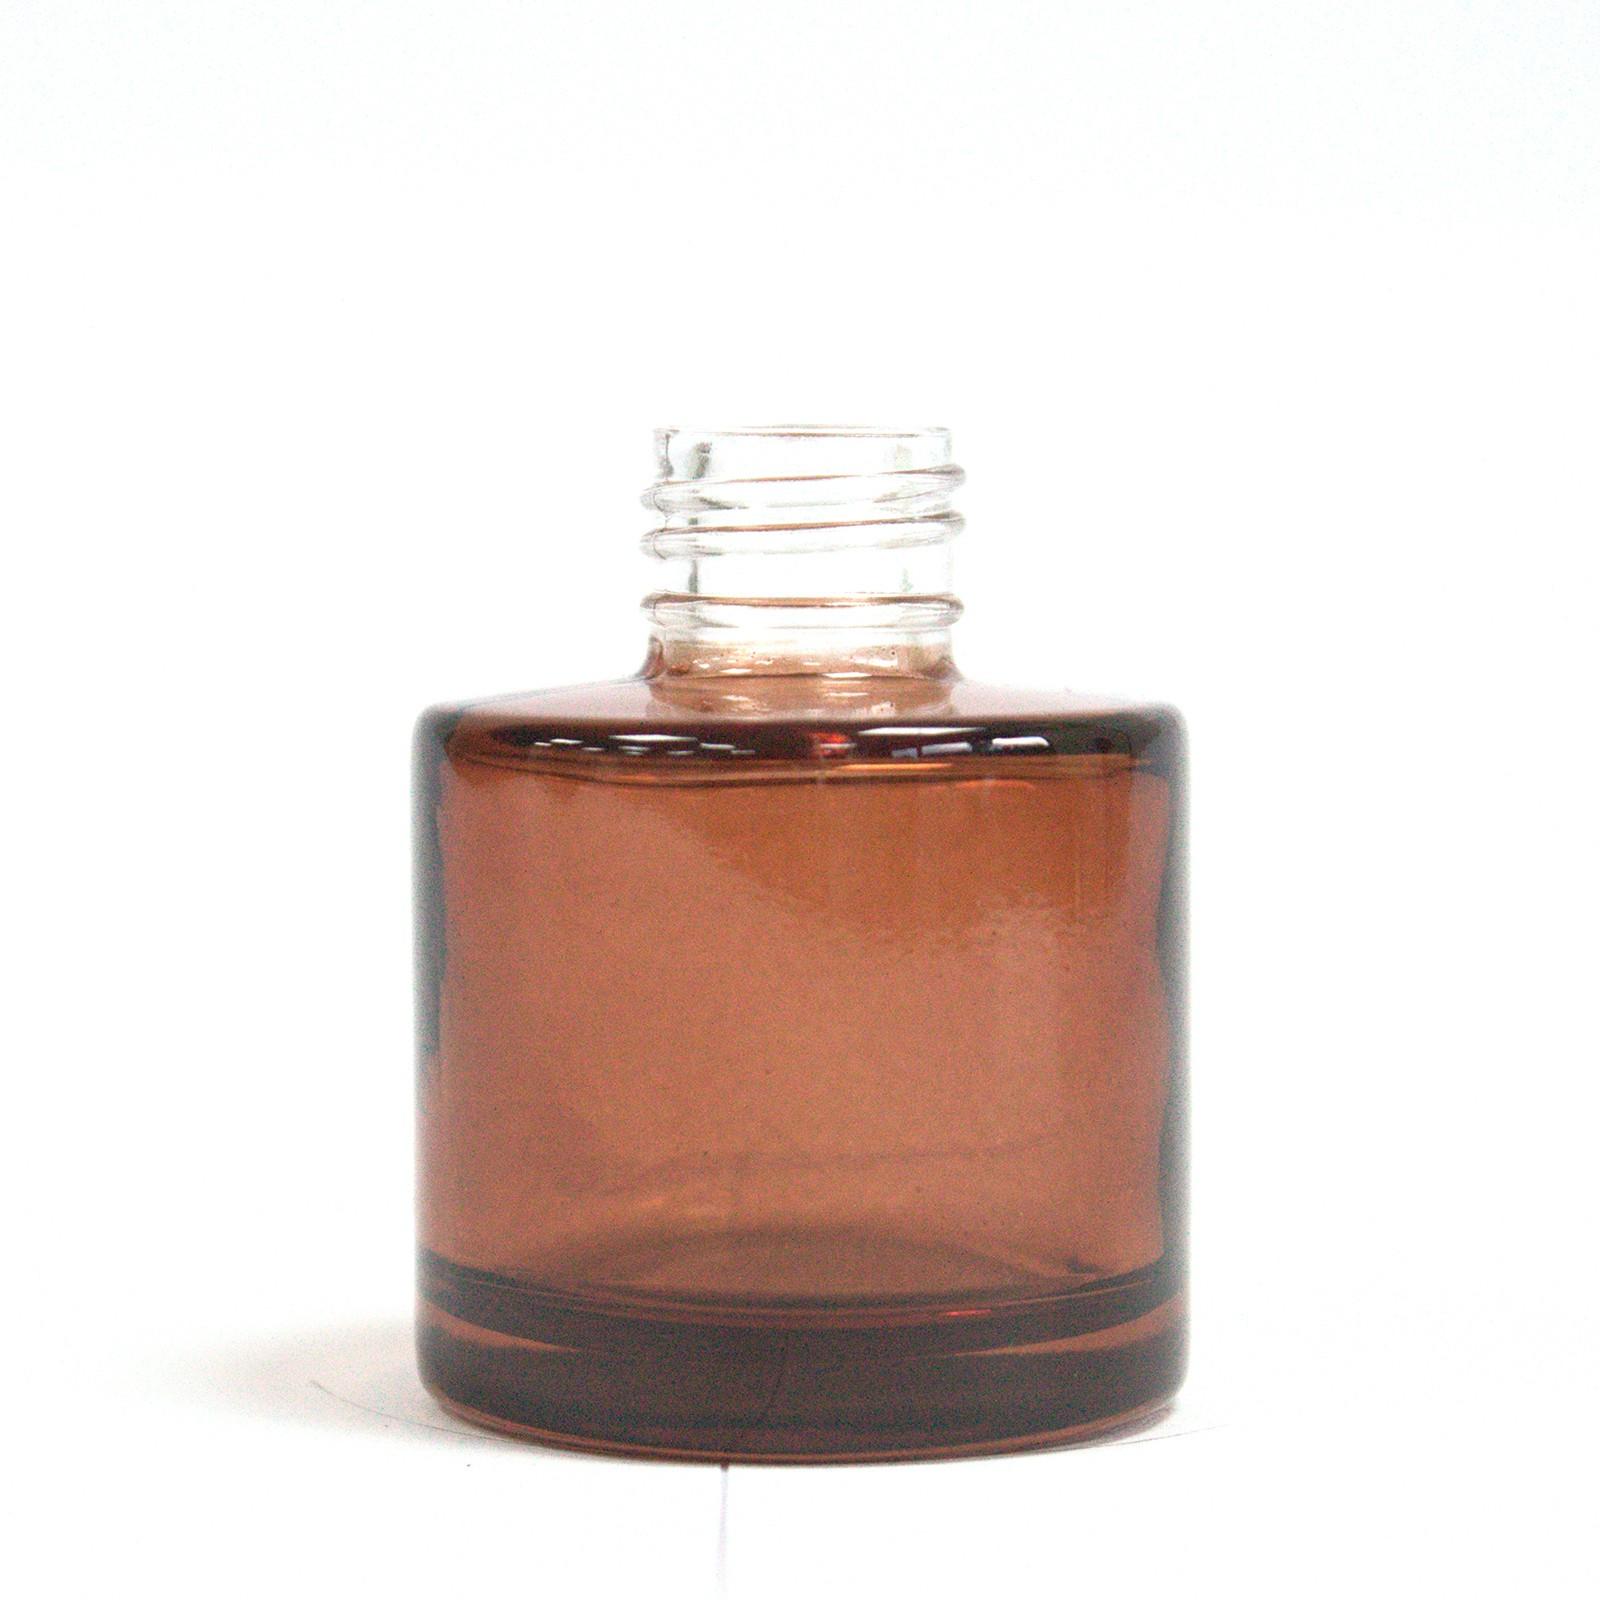 50 ml Round Reed Diffuser Bottlle Amber